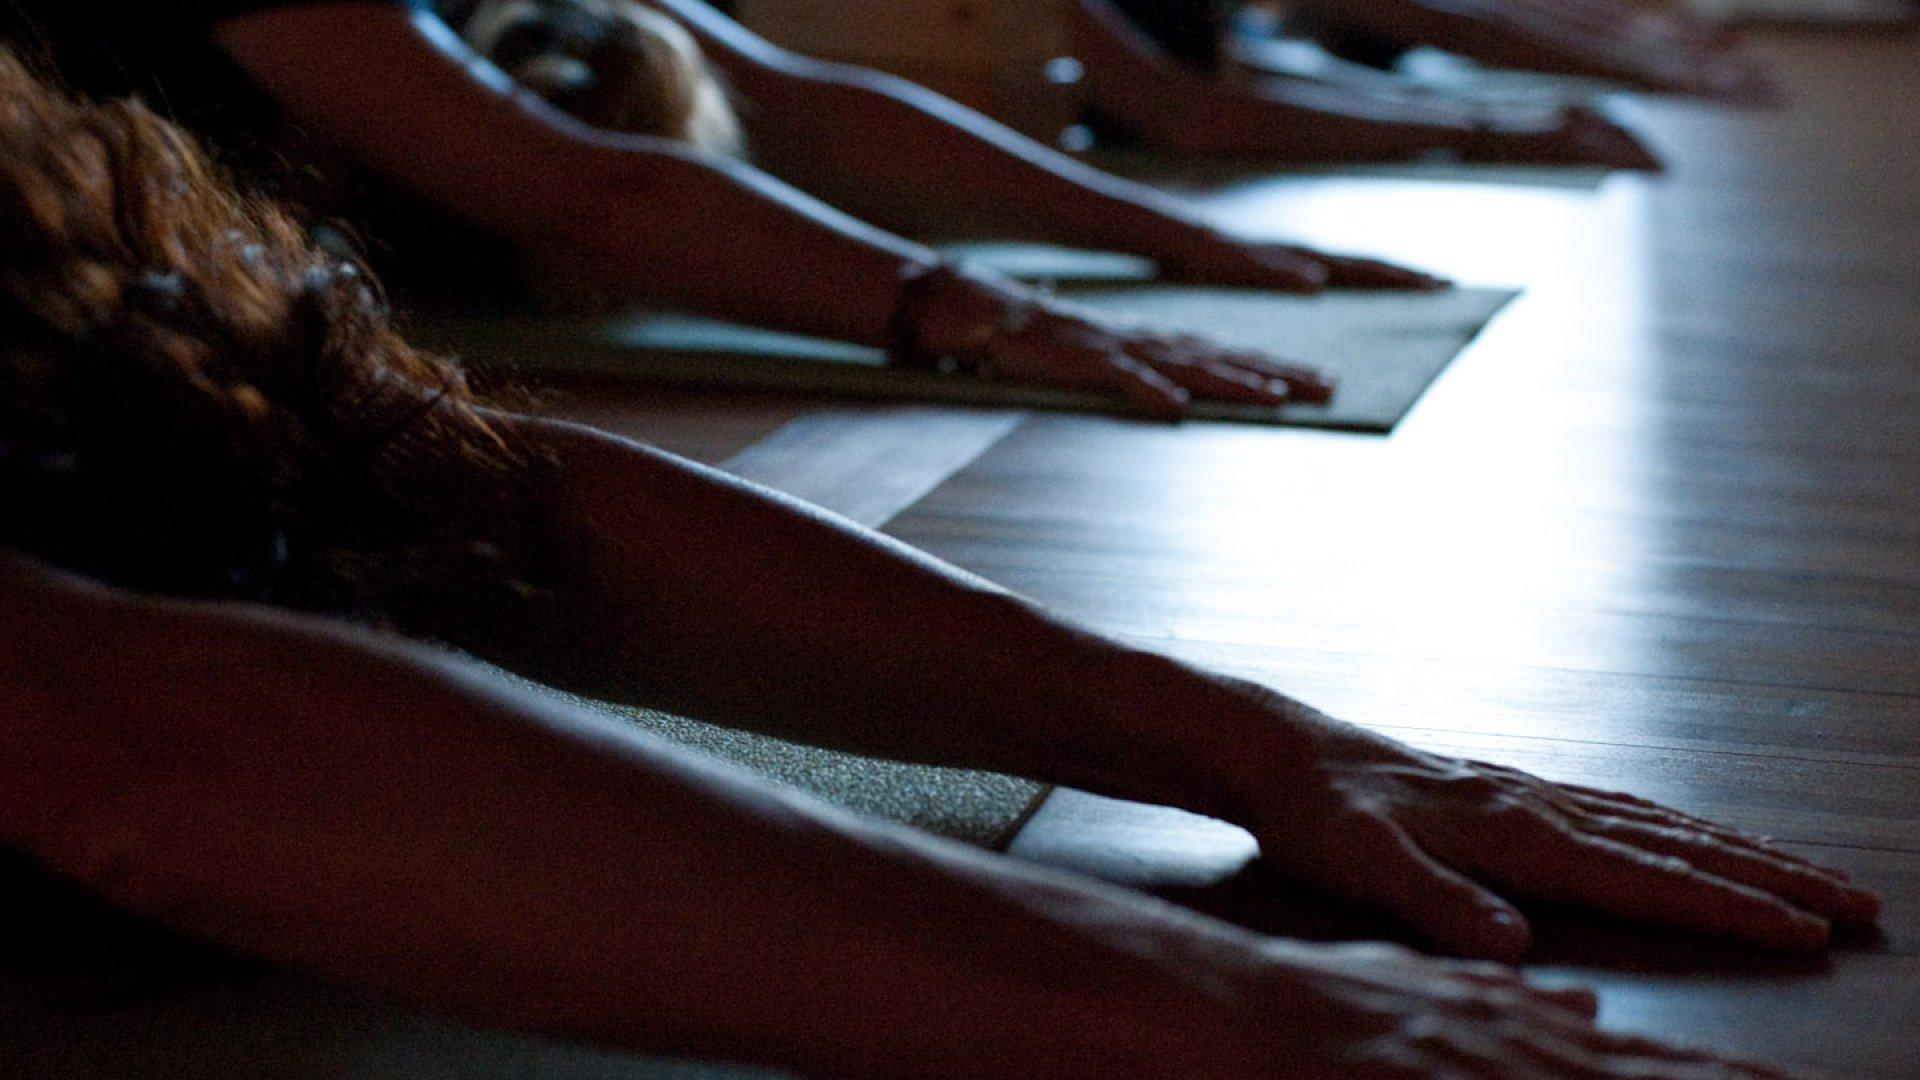 Handle Change Like a Yoga Master